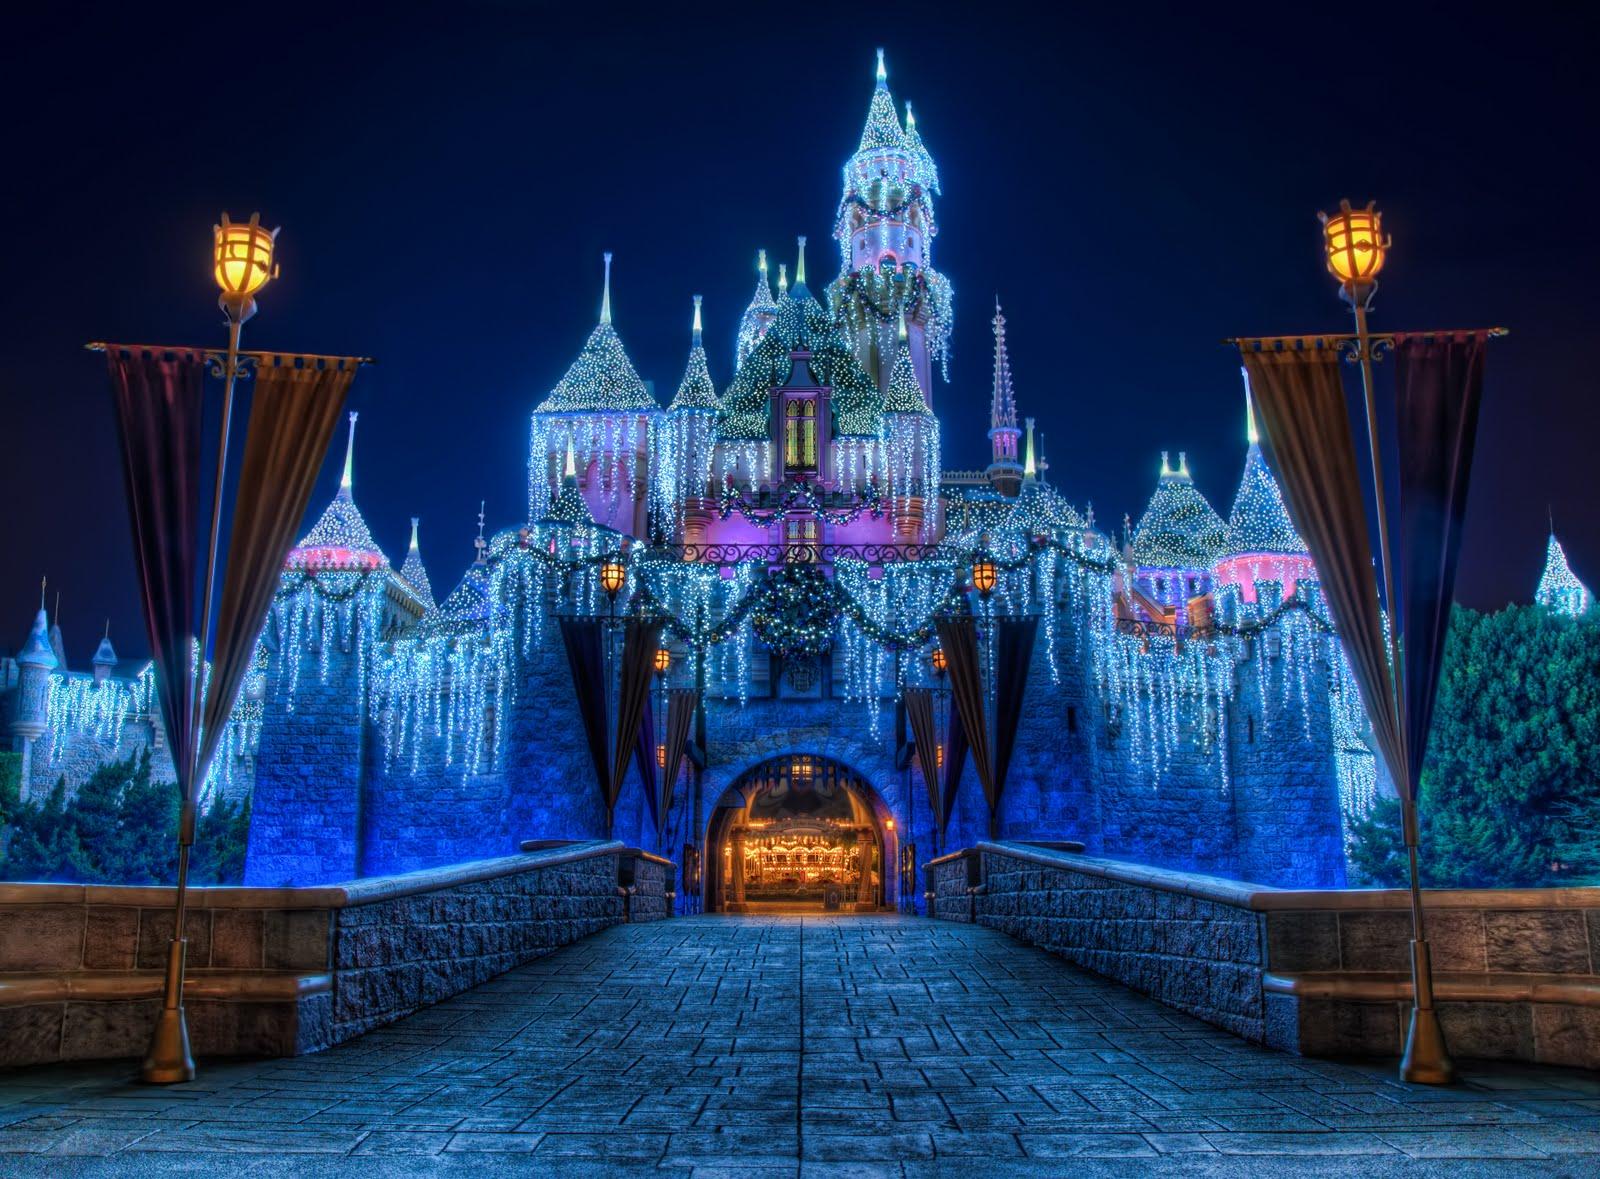 Image - Disneyland Christmas Castle.jpg | Disney Wiki | FANDOM ...